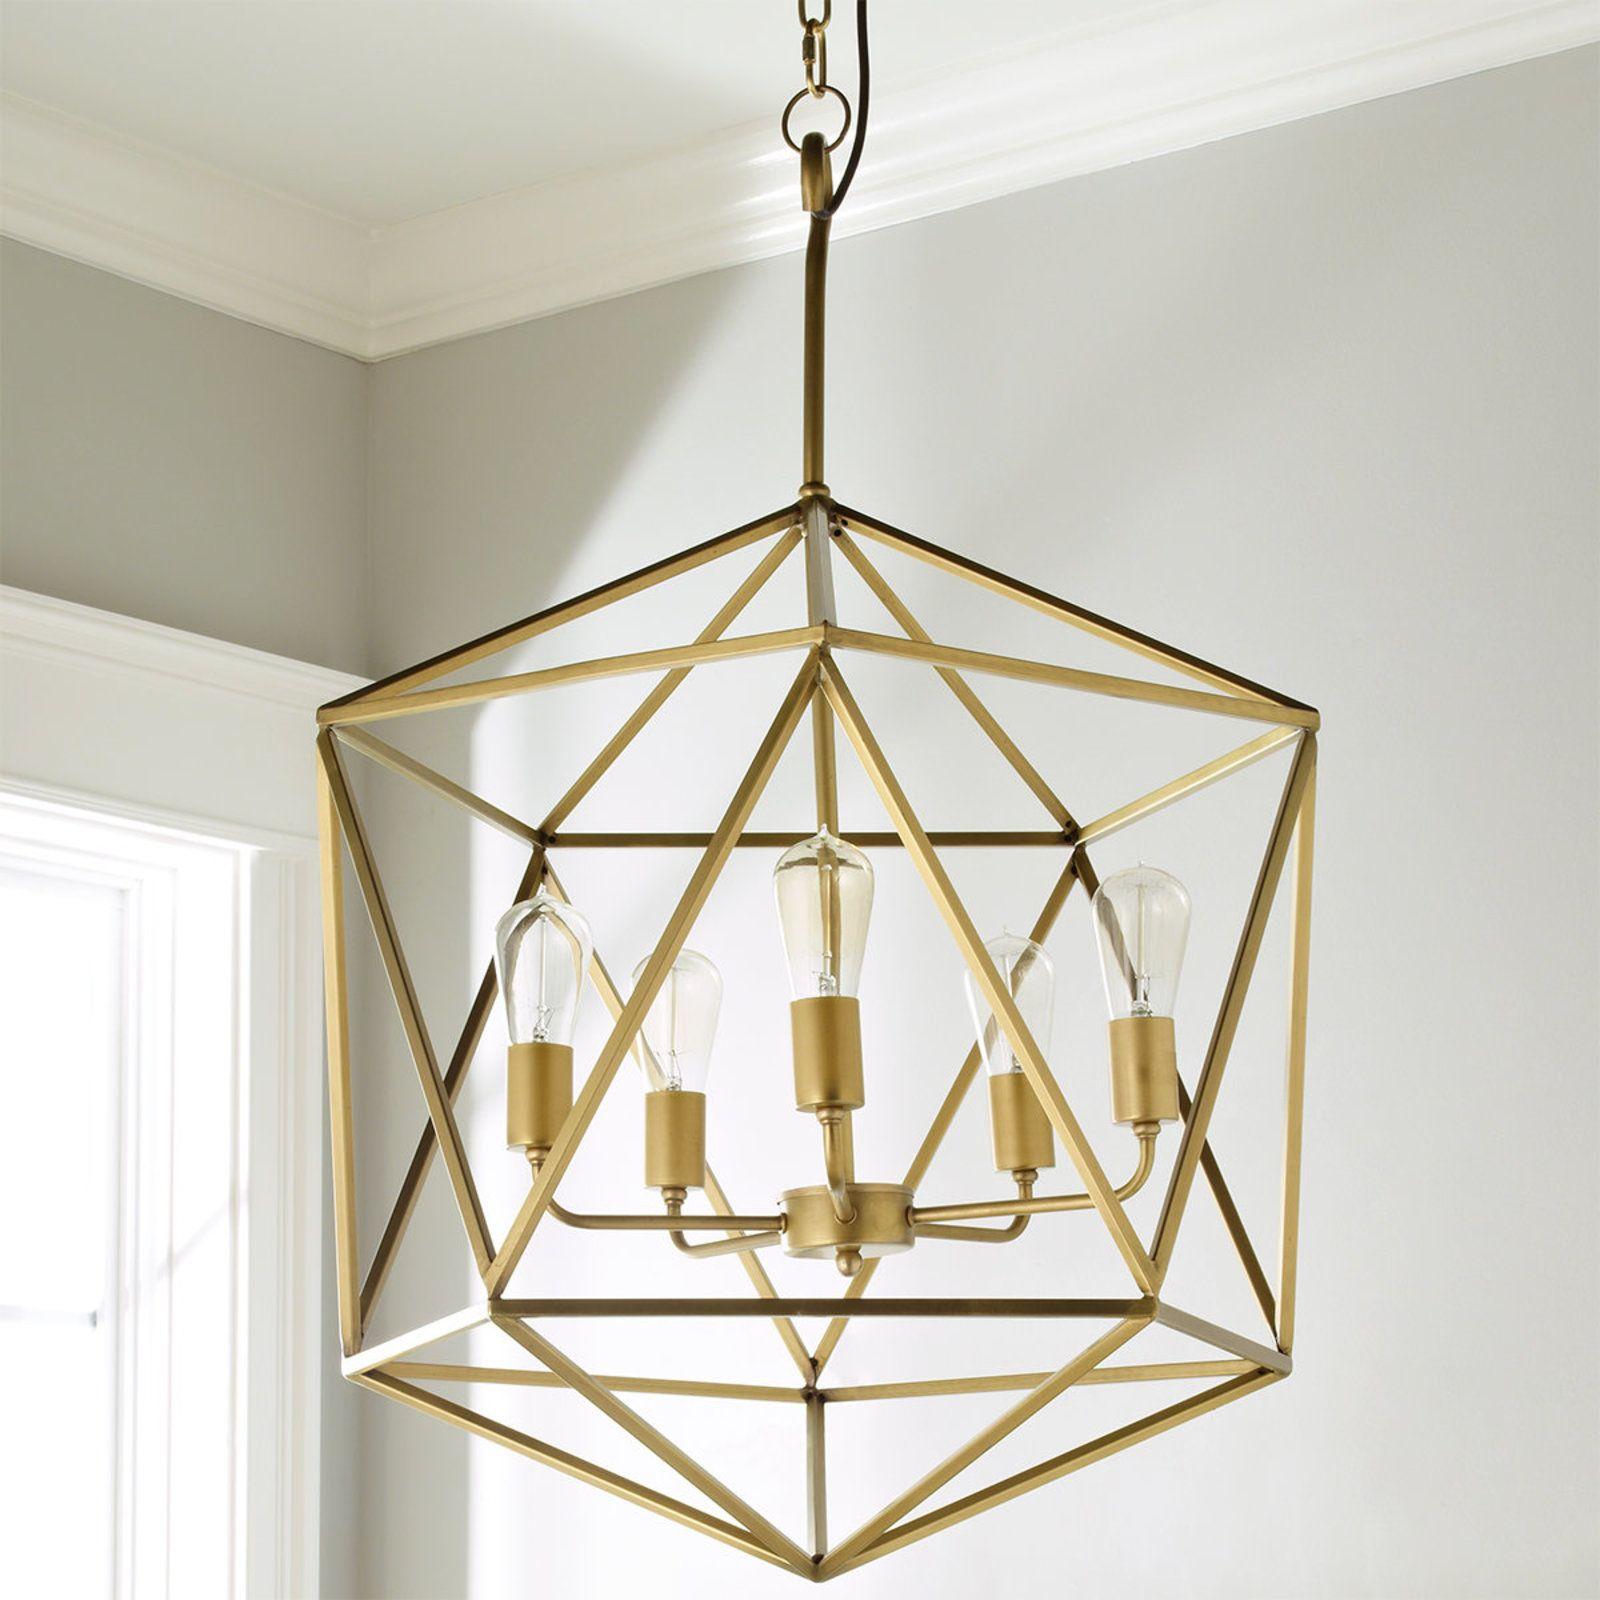 Large prism chandelier lighting pinterest antique brass large prism chandelier antiquebrass shades of light aloadofball Gallery